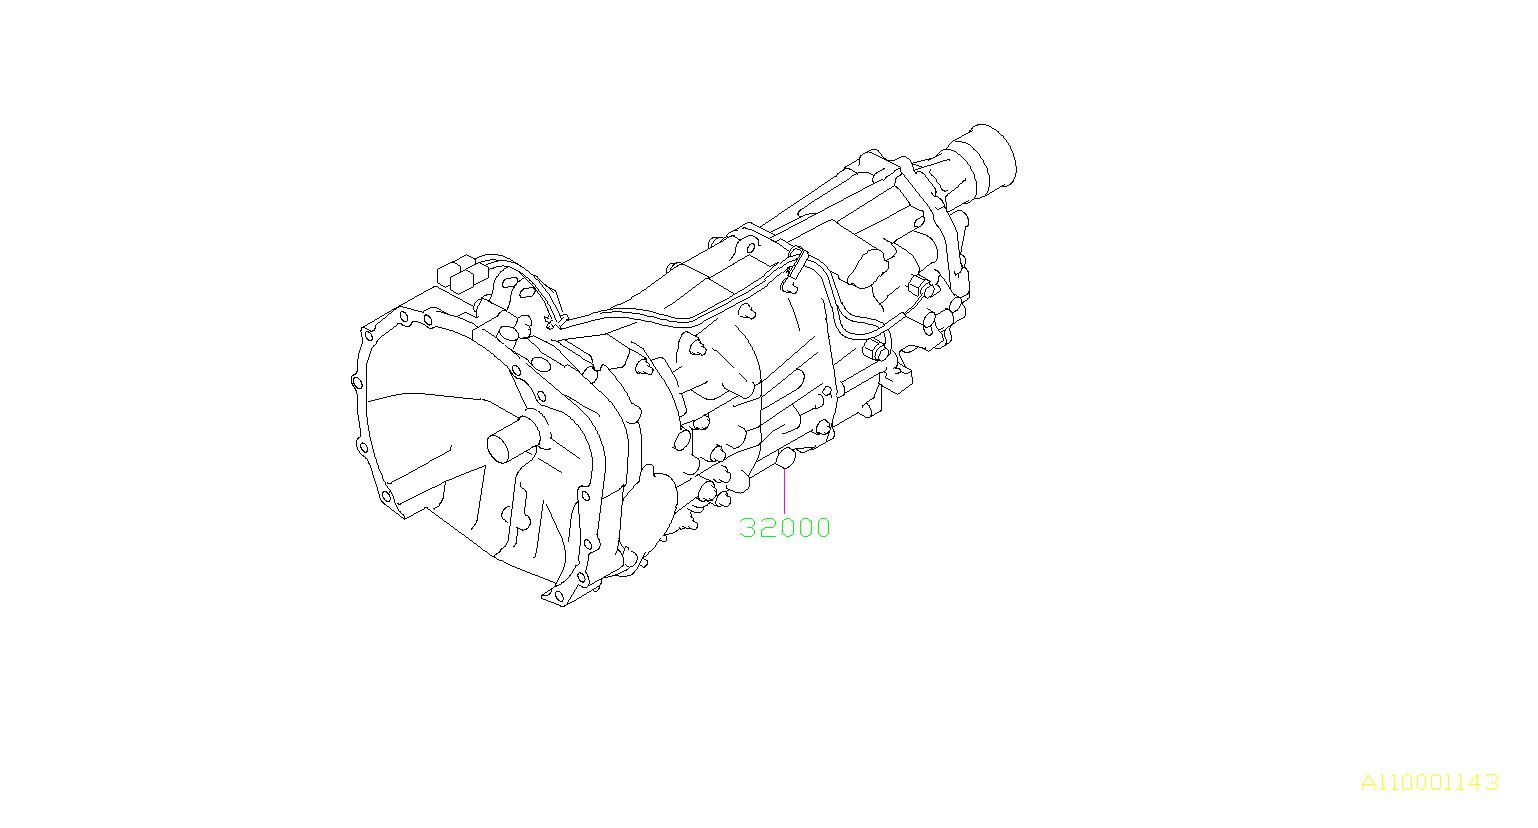 2014 subaru crosstrek manual transmission assembly assy 32000ak280 genuine subaru part. Black Bedroom Furniture Sets. Home Design Ideas